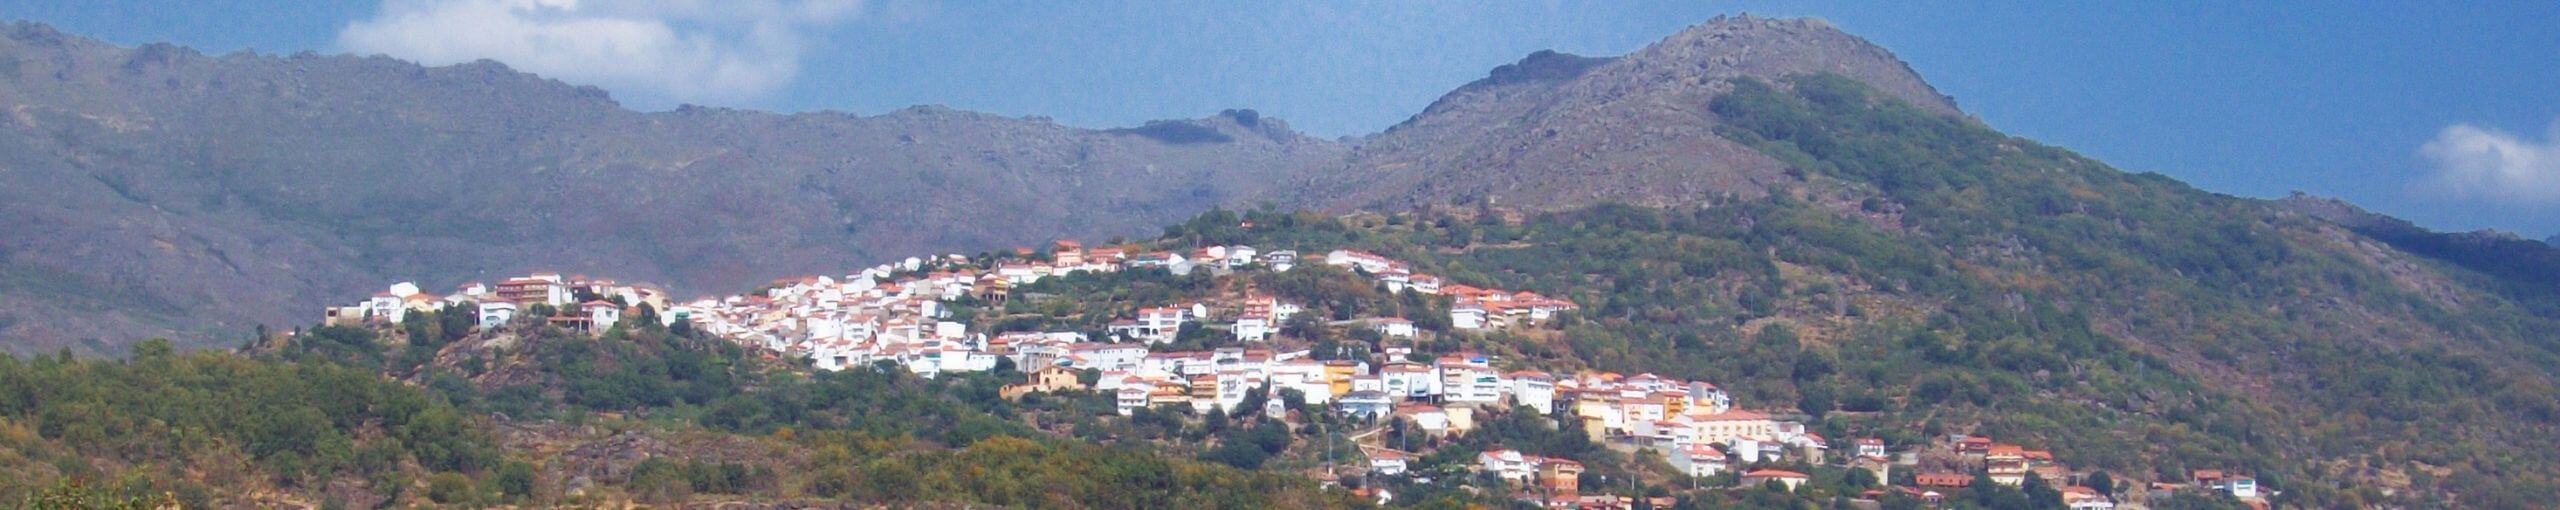 Valle de Jálama